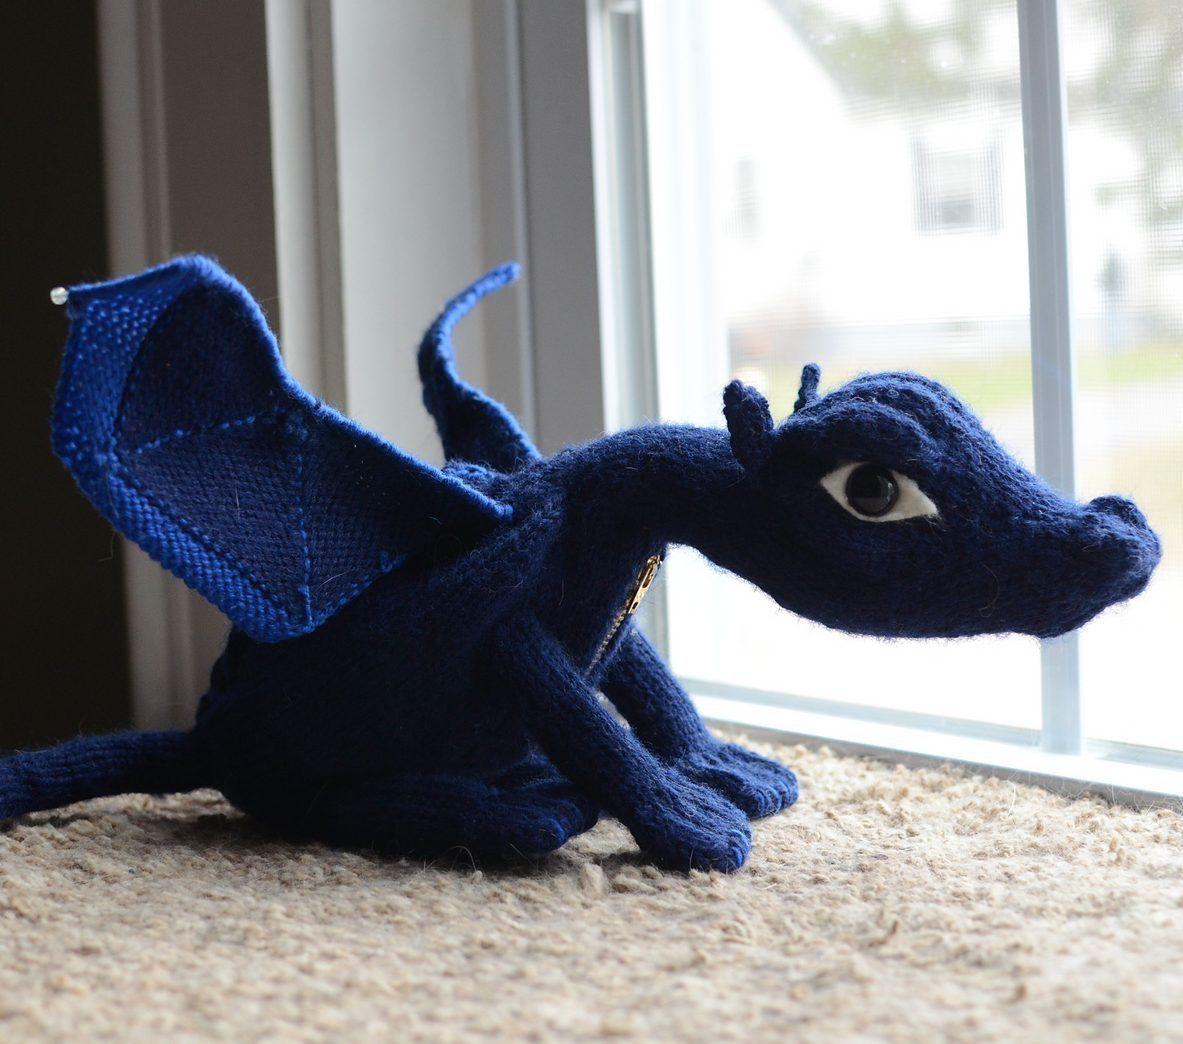 Dragon knitting patterns terry pratchett knitting patterns and dragon knitting patterns bankloansurffo Gallery